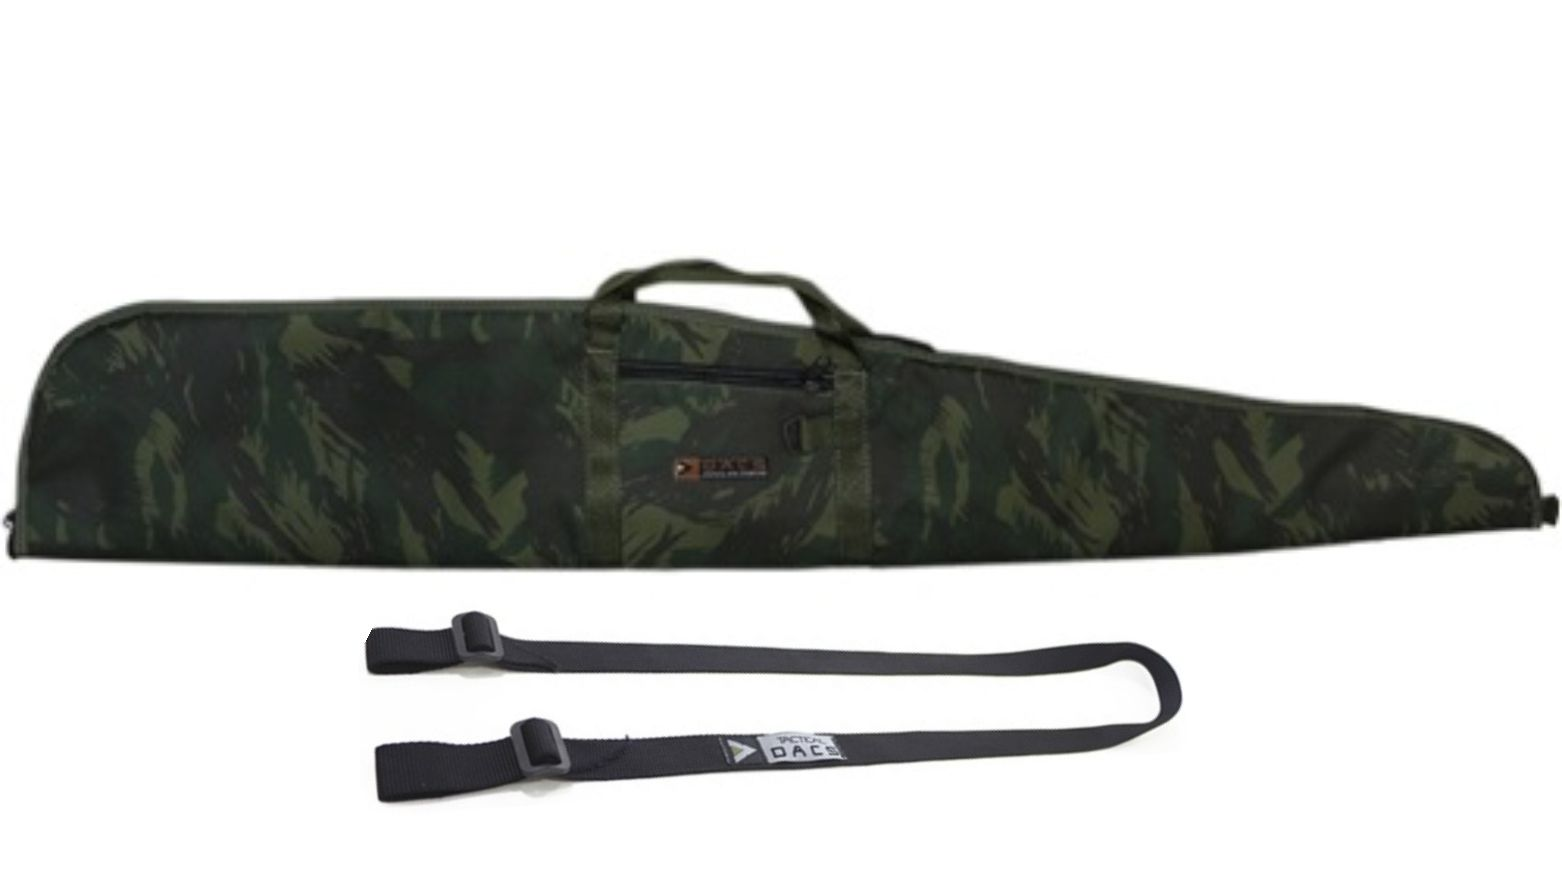 Capa  e bandoleira  p/ Arma Longa 1,30m - Camuflada Exercito Brasileiro